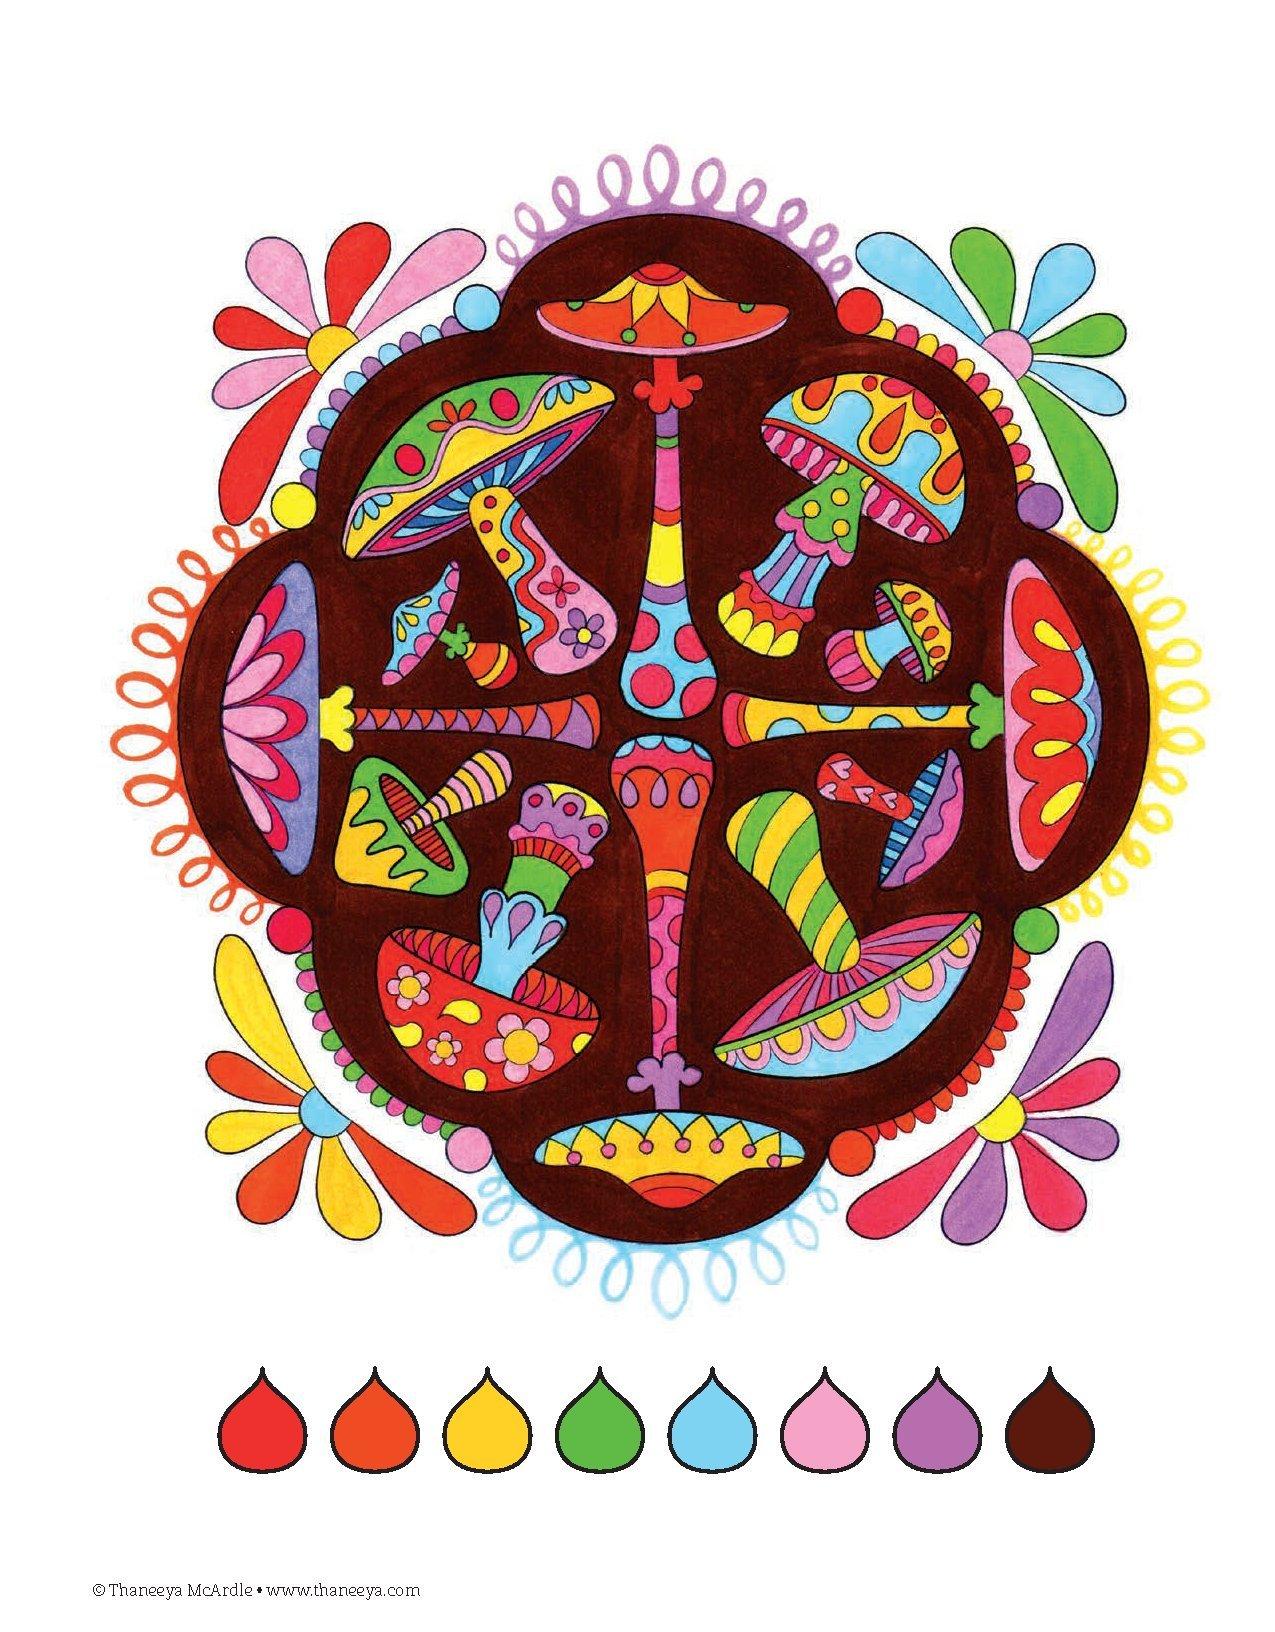 Nature Mandalas Coloring Book Thaneeya McArdle 9781574219579 Books